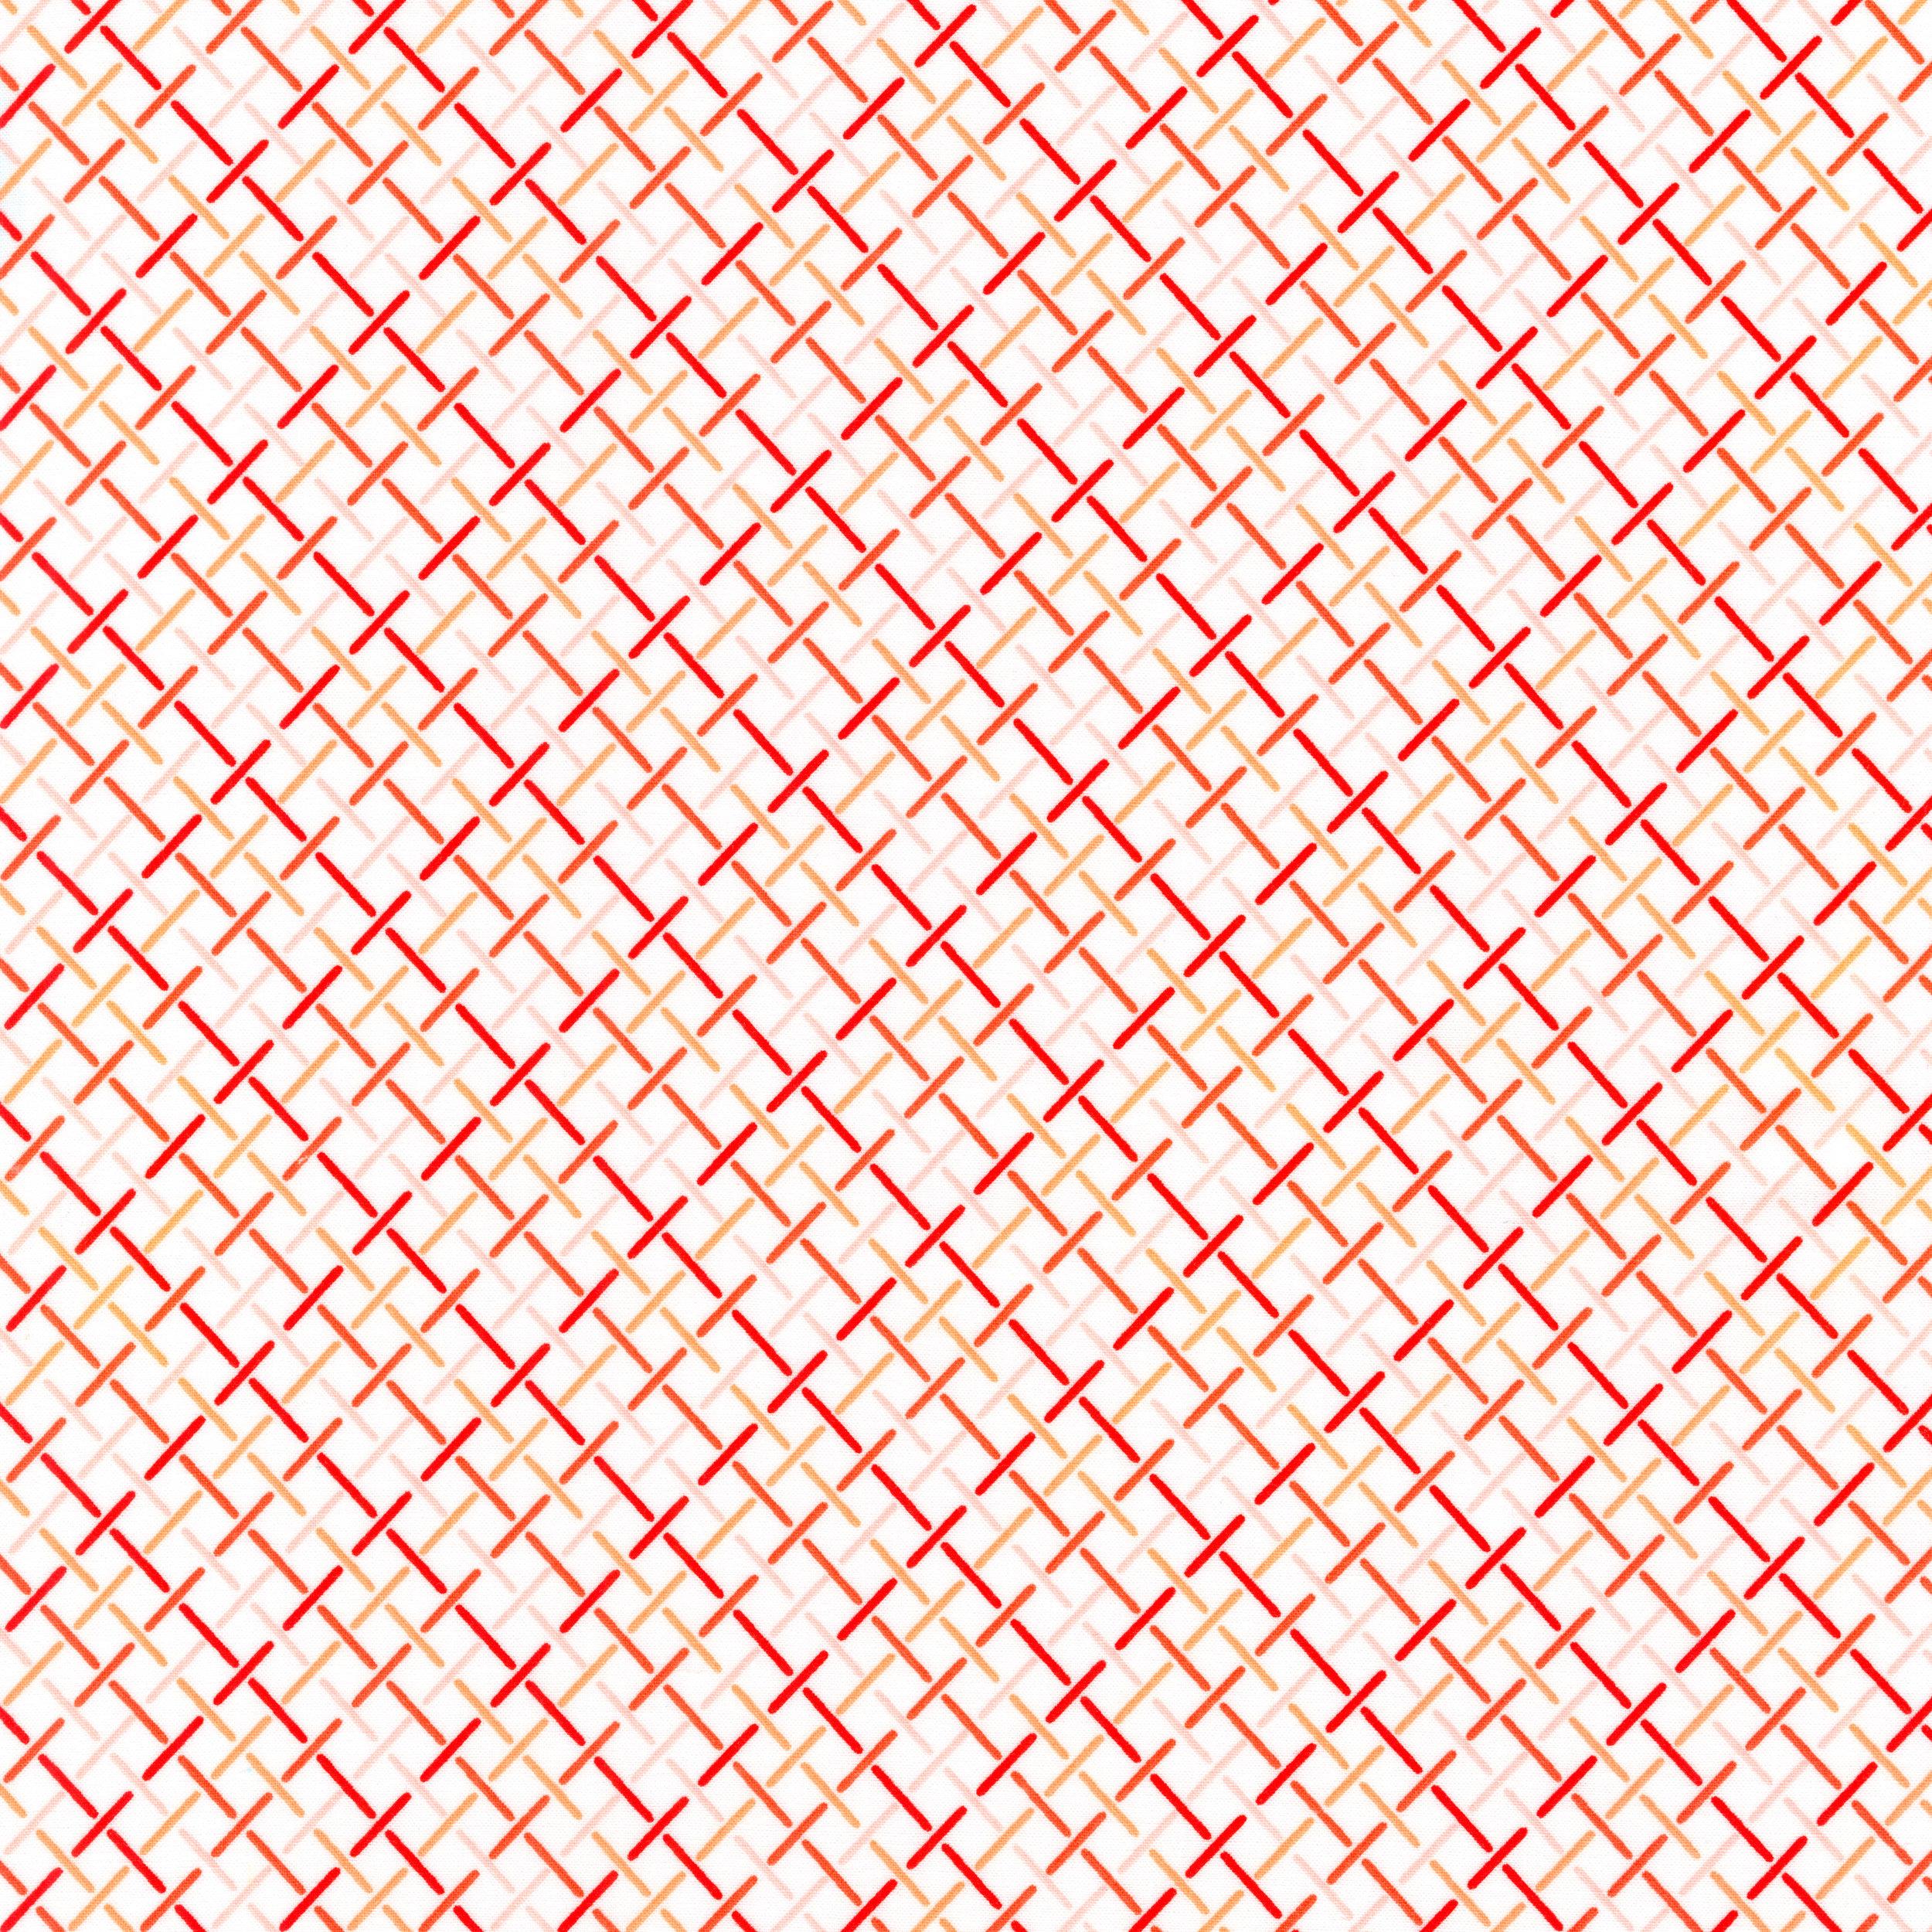 AVL-18153-144 Raffia Weave PEACH